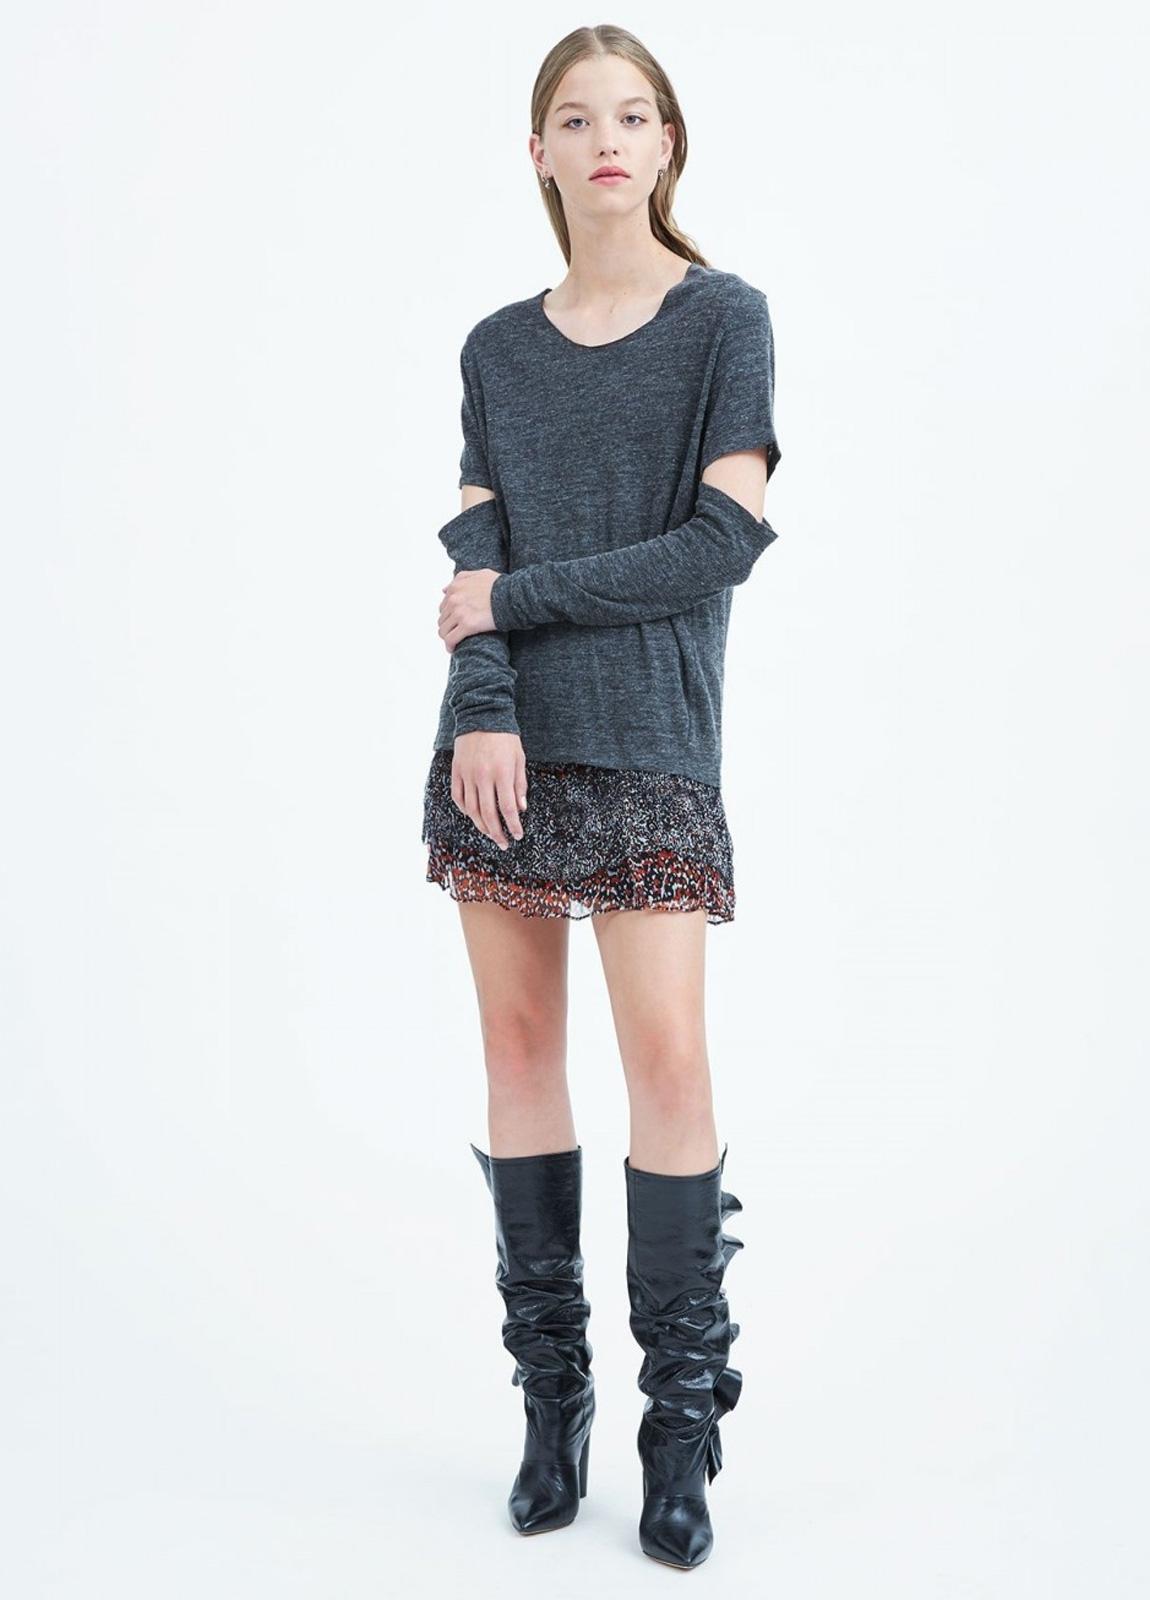 Camiseta woman manga larga color gris con abertura en codos. 63% Viscosa 28% Lana 9% Poliamida. - Ítem3